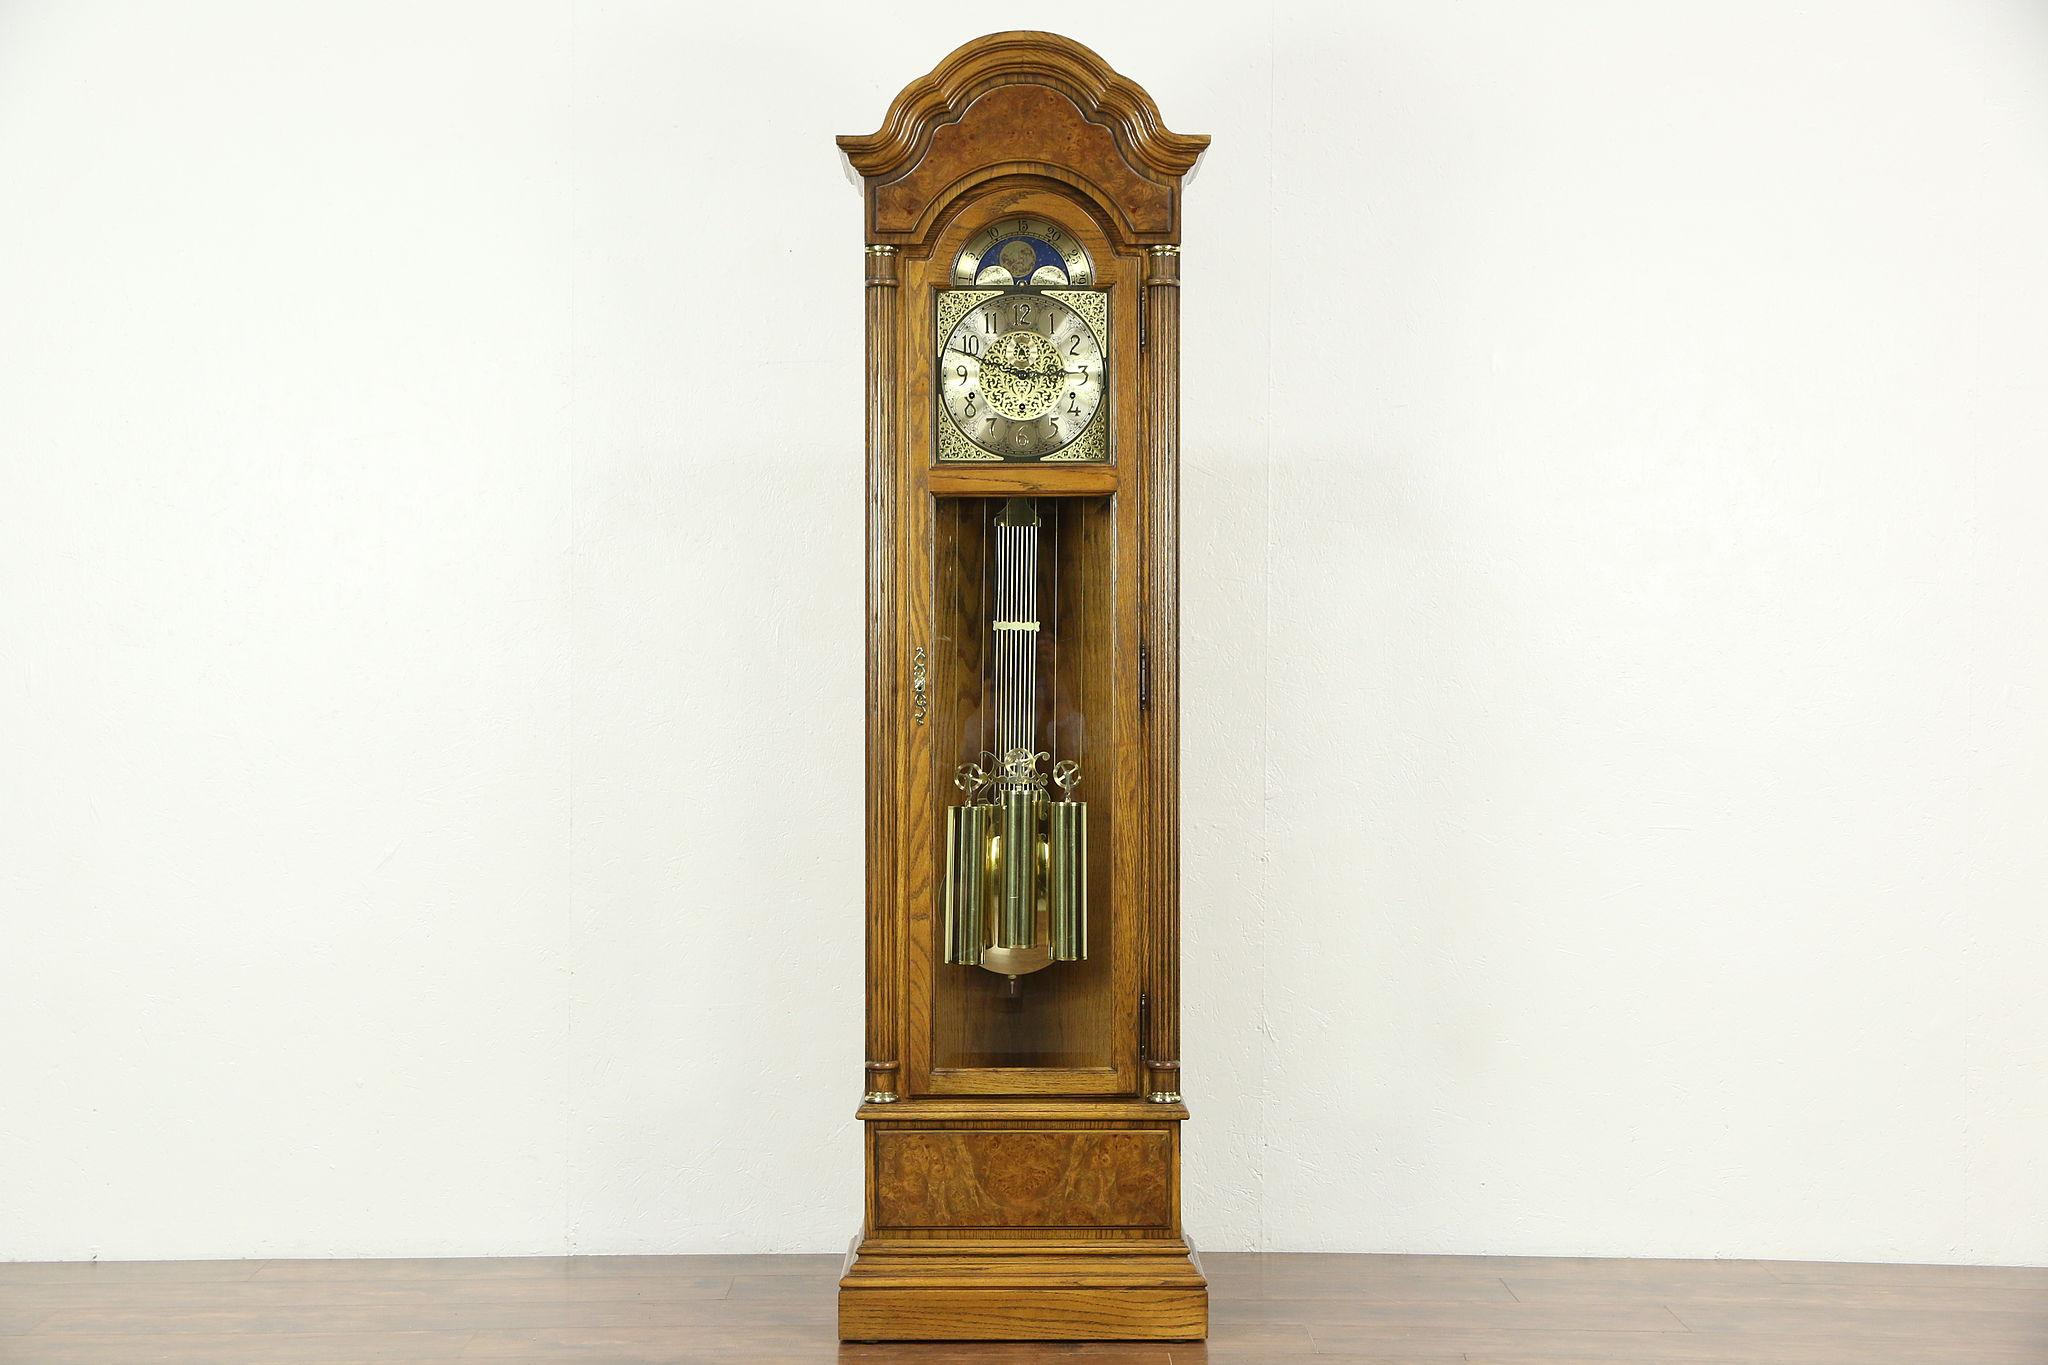 Oak Burl Long Case Grandfather Clock Westminster Chime Howard Miller